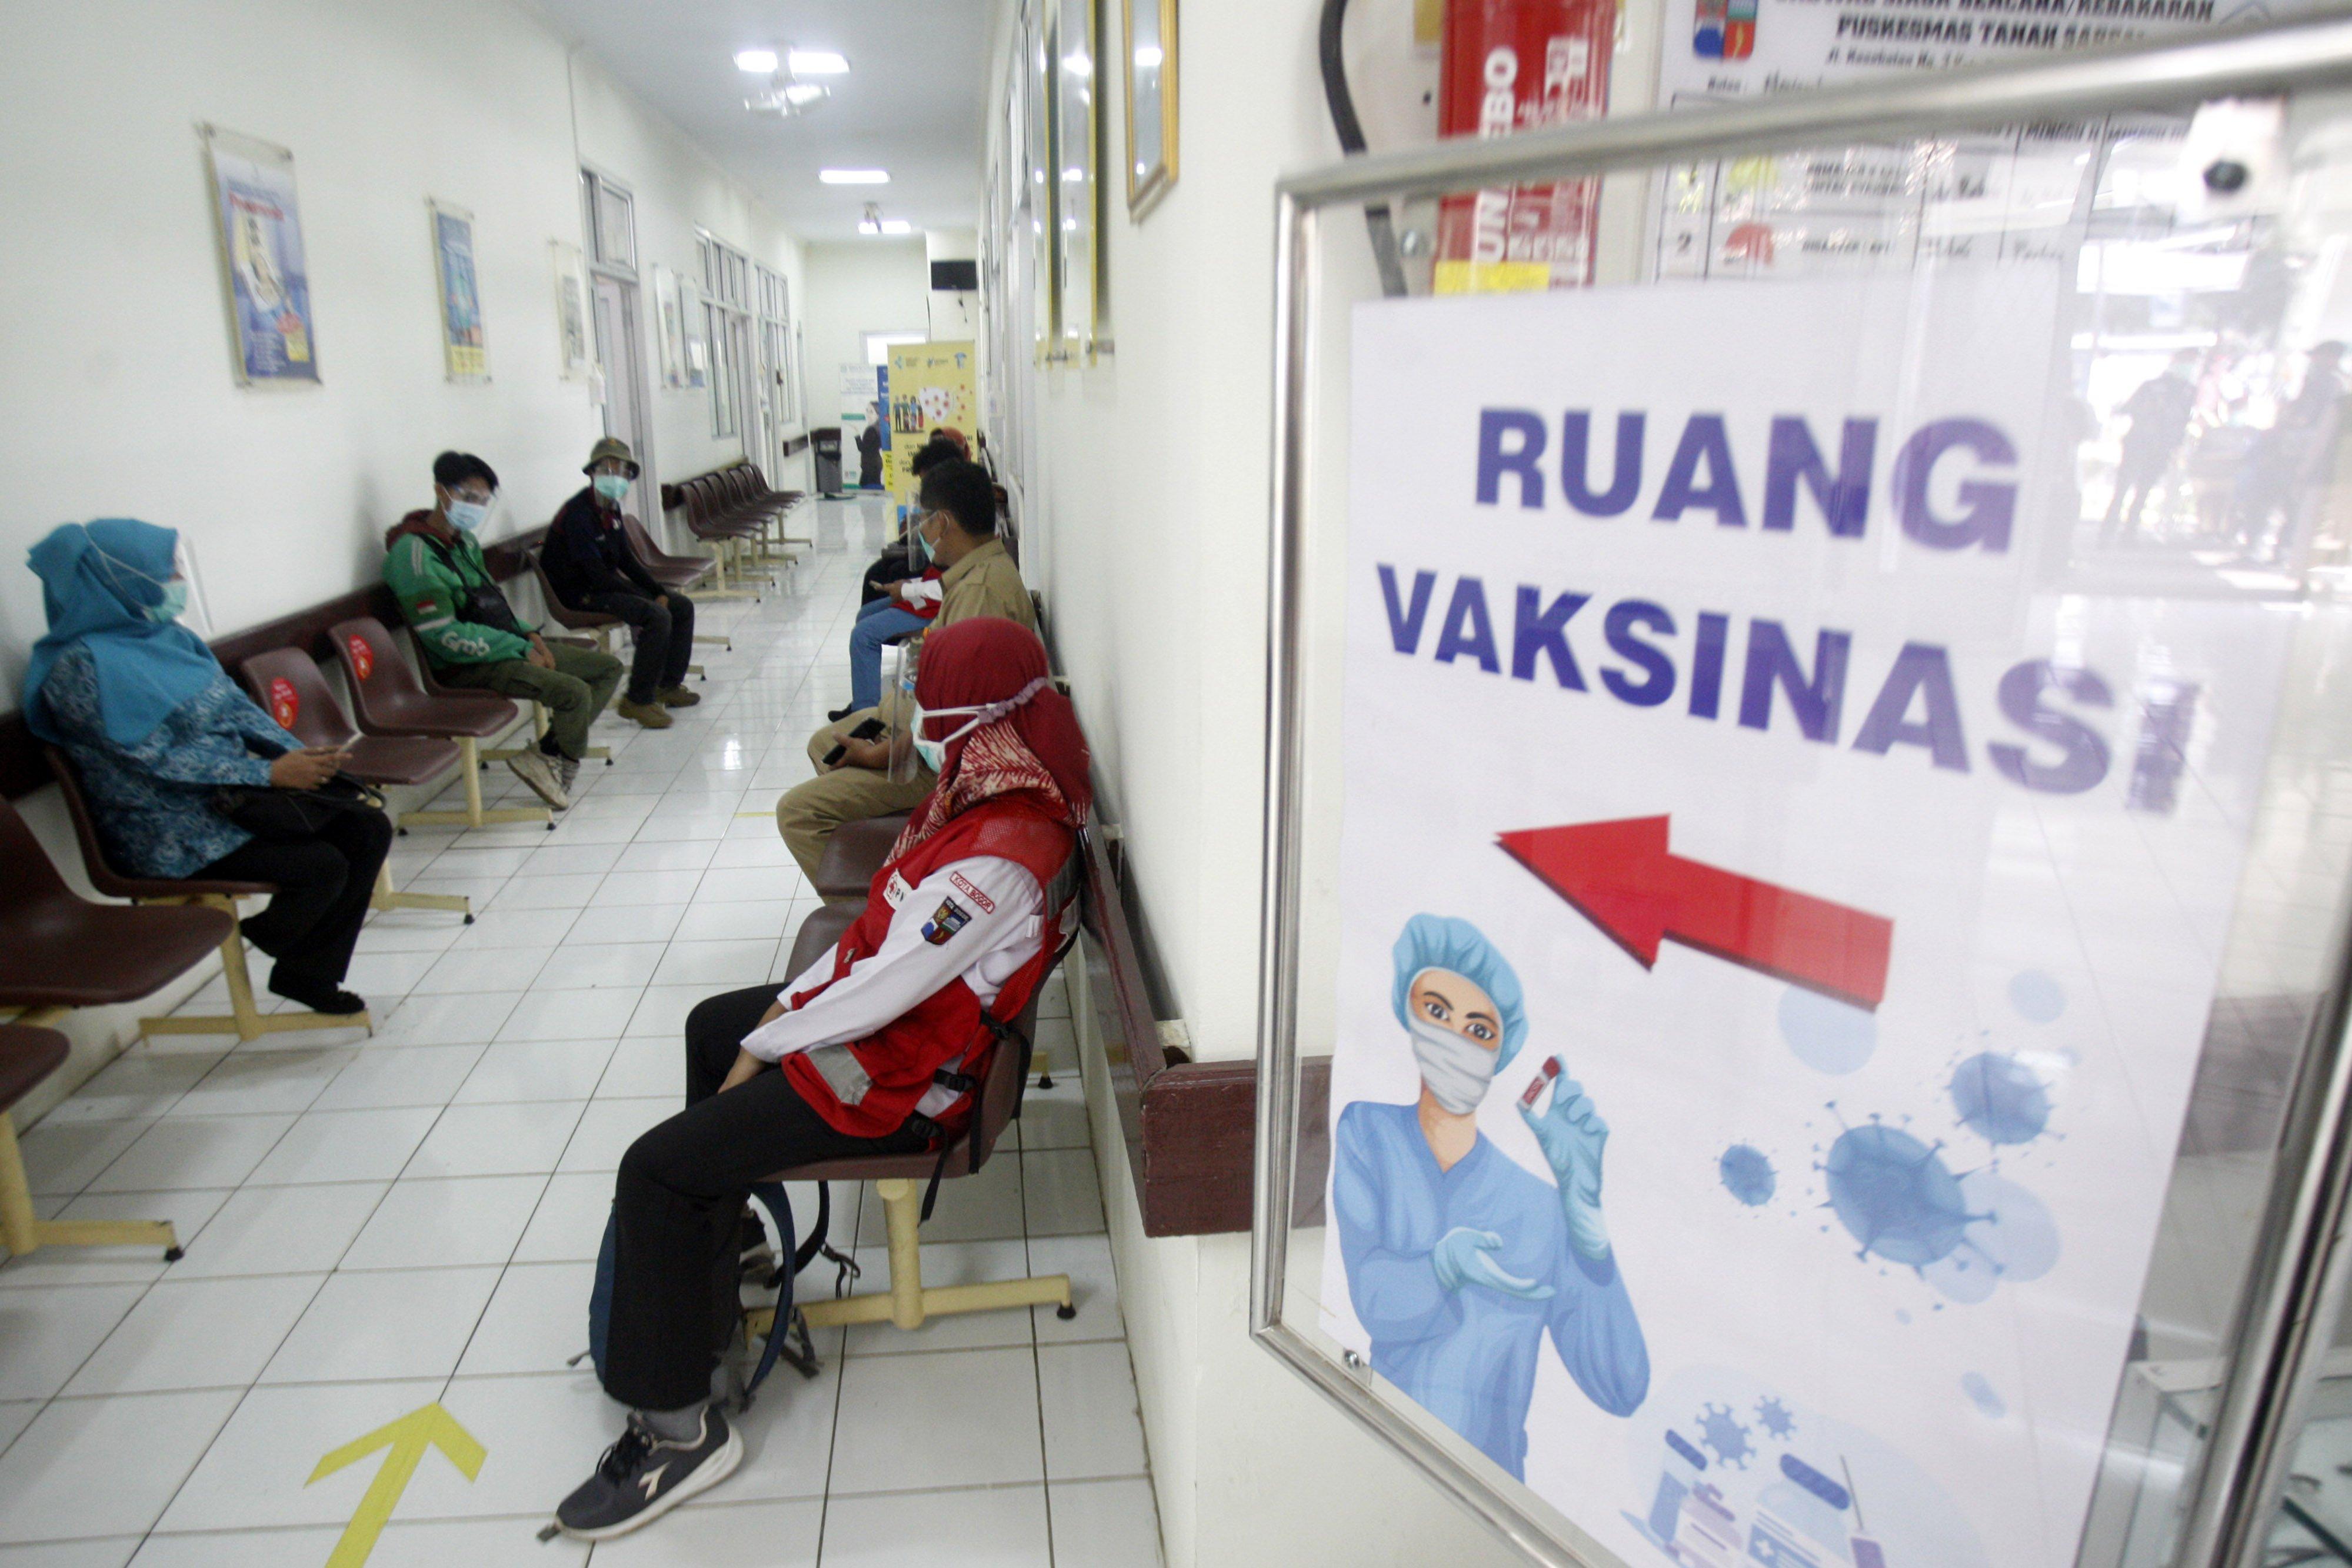 Sejumlah relawan antre untuk di vaksin pada simulasi vaksinasi COVID-19 di Puskesamas Tanah Sareal, Kota Bogor, Jawa Barat, Rabu (18/11/2020). Menteri Kesehatan (Menkes) Terawan Agus Putranto mengatakan, pemerintah menargetkan imunisasi COVID-19 akan diberikan kepada 67 persen dari 160 juta penduduk berusia 18-59 tahun atau sebanyak 107,2 juta orang, pemberian vaksinasi akan dilakukan melalui skema vaksin program dan vaksin mandiri.